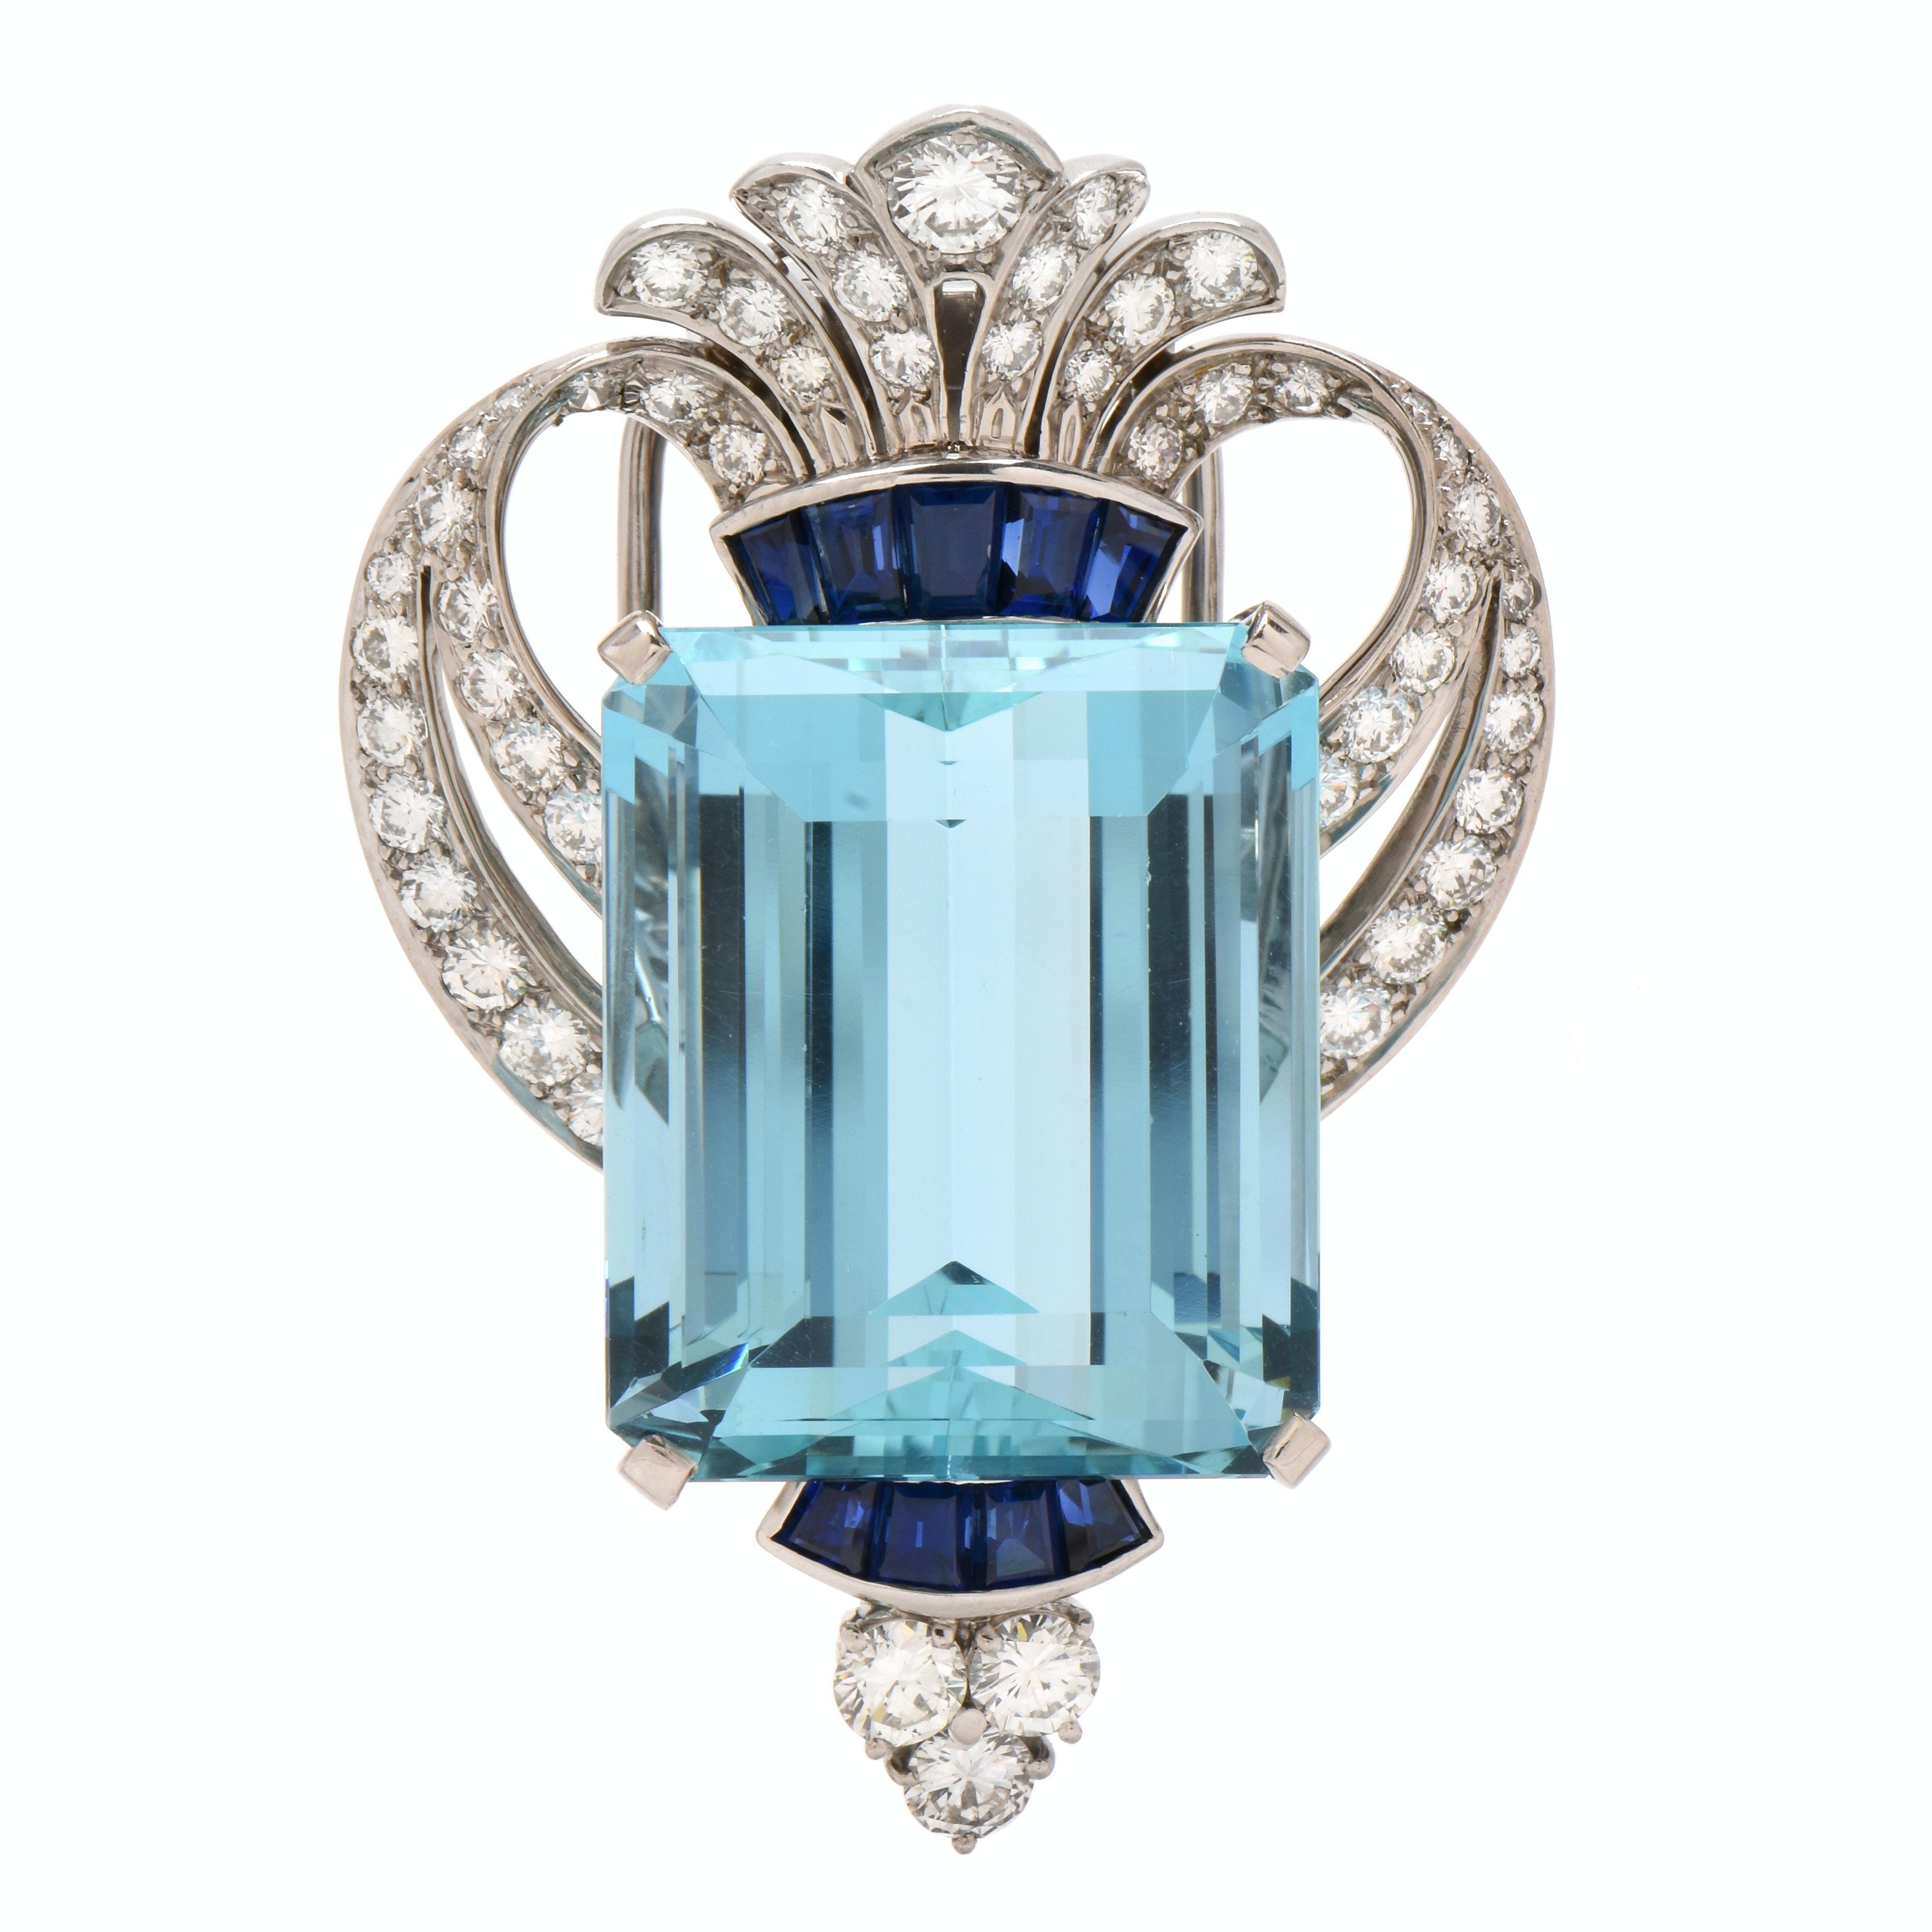 Tiffany & Co. Palladium 44.02 CT Aquamarine 2.48 CTW Diamond and Sapphire Brooch